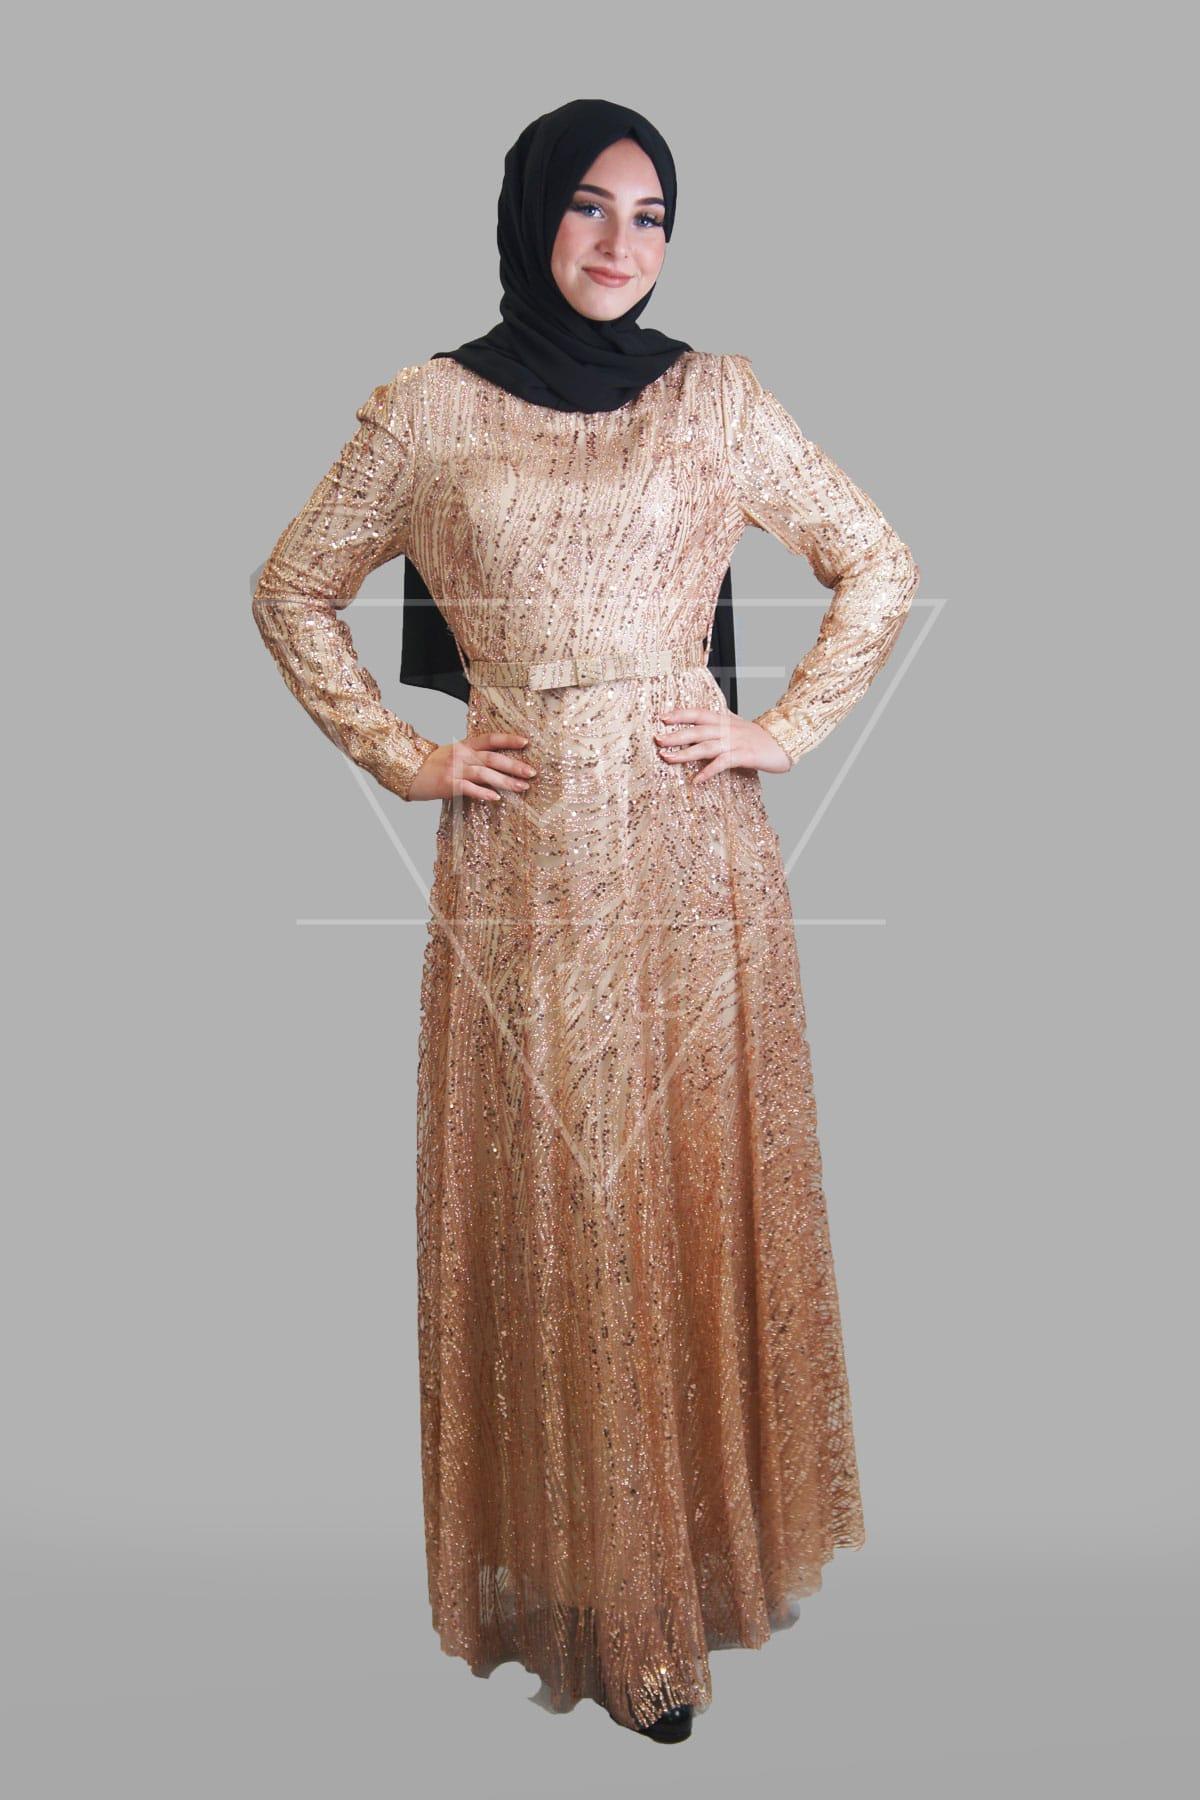 20 Perfekt Goldenes Abendkleid Stylish13 Einfach Goldenes Abendkleid Bester Preis